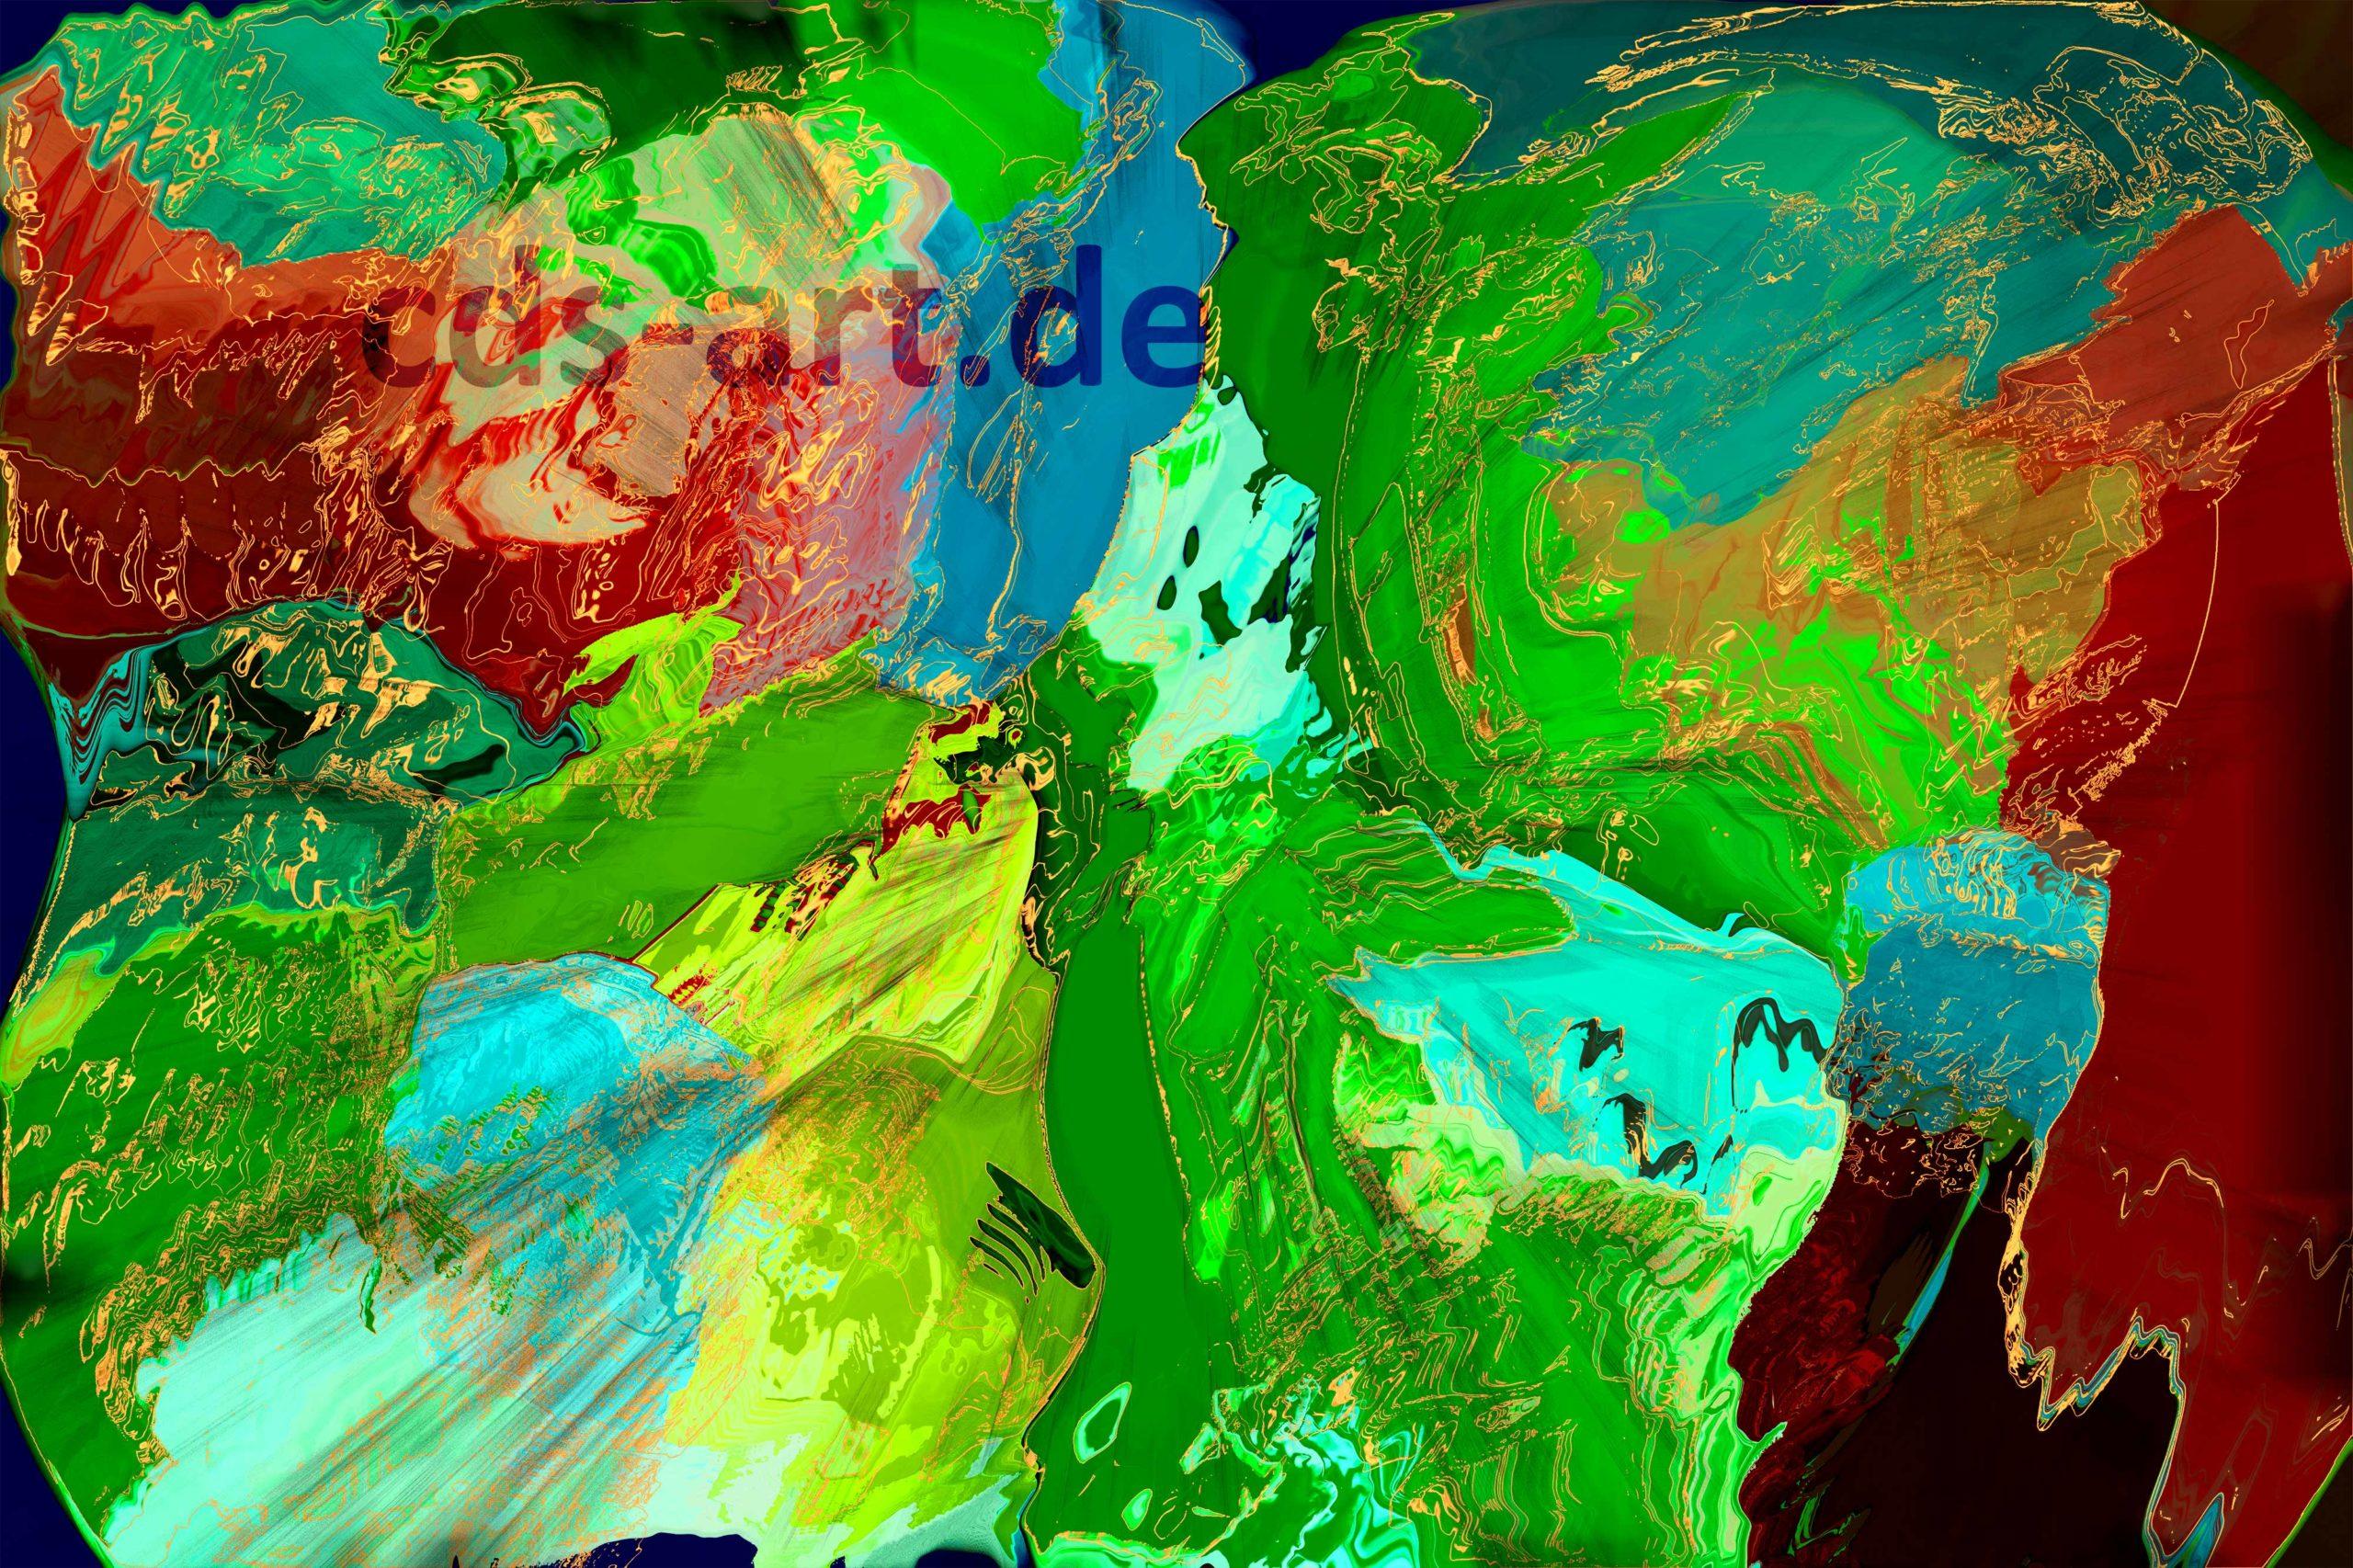 colorworks 2